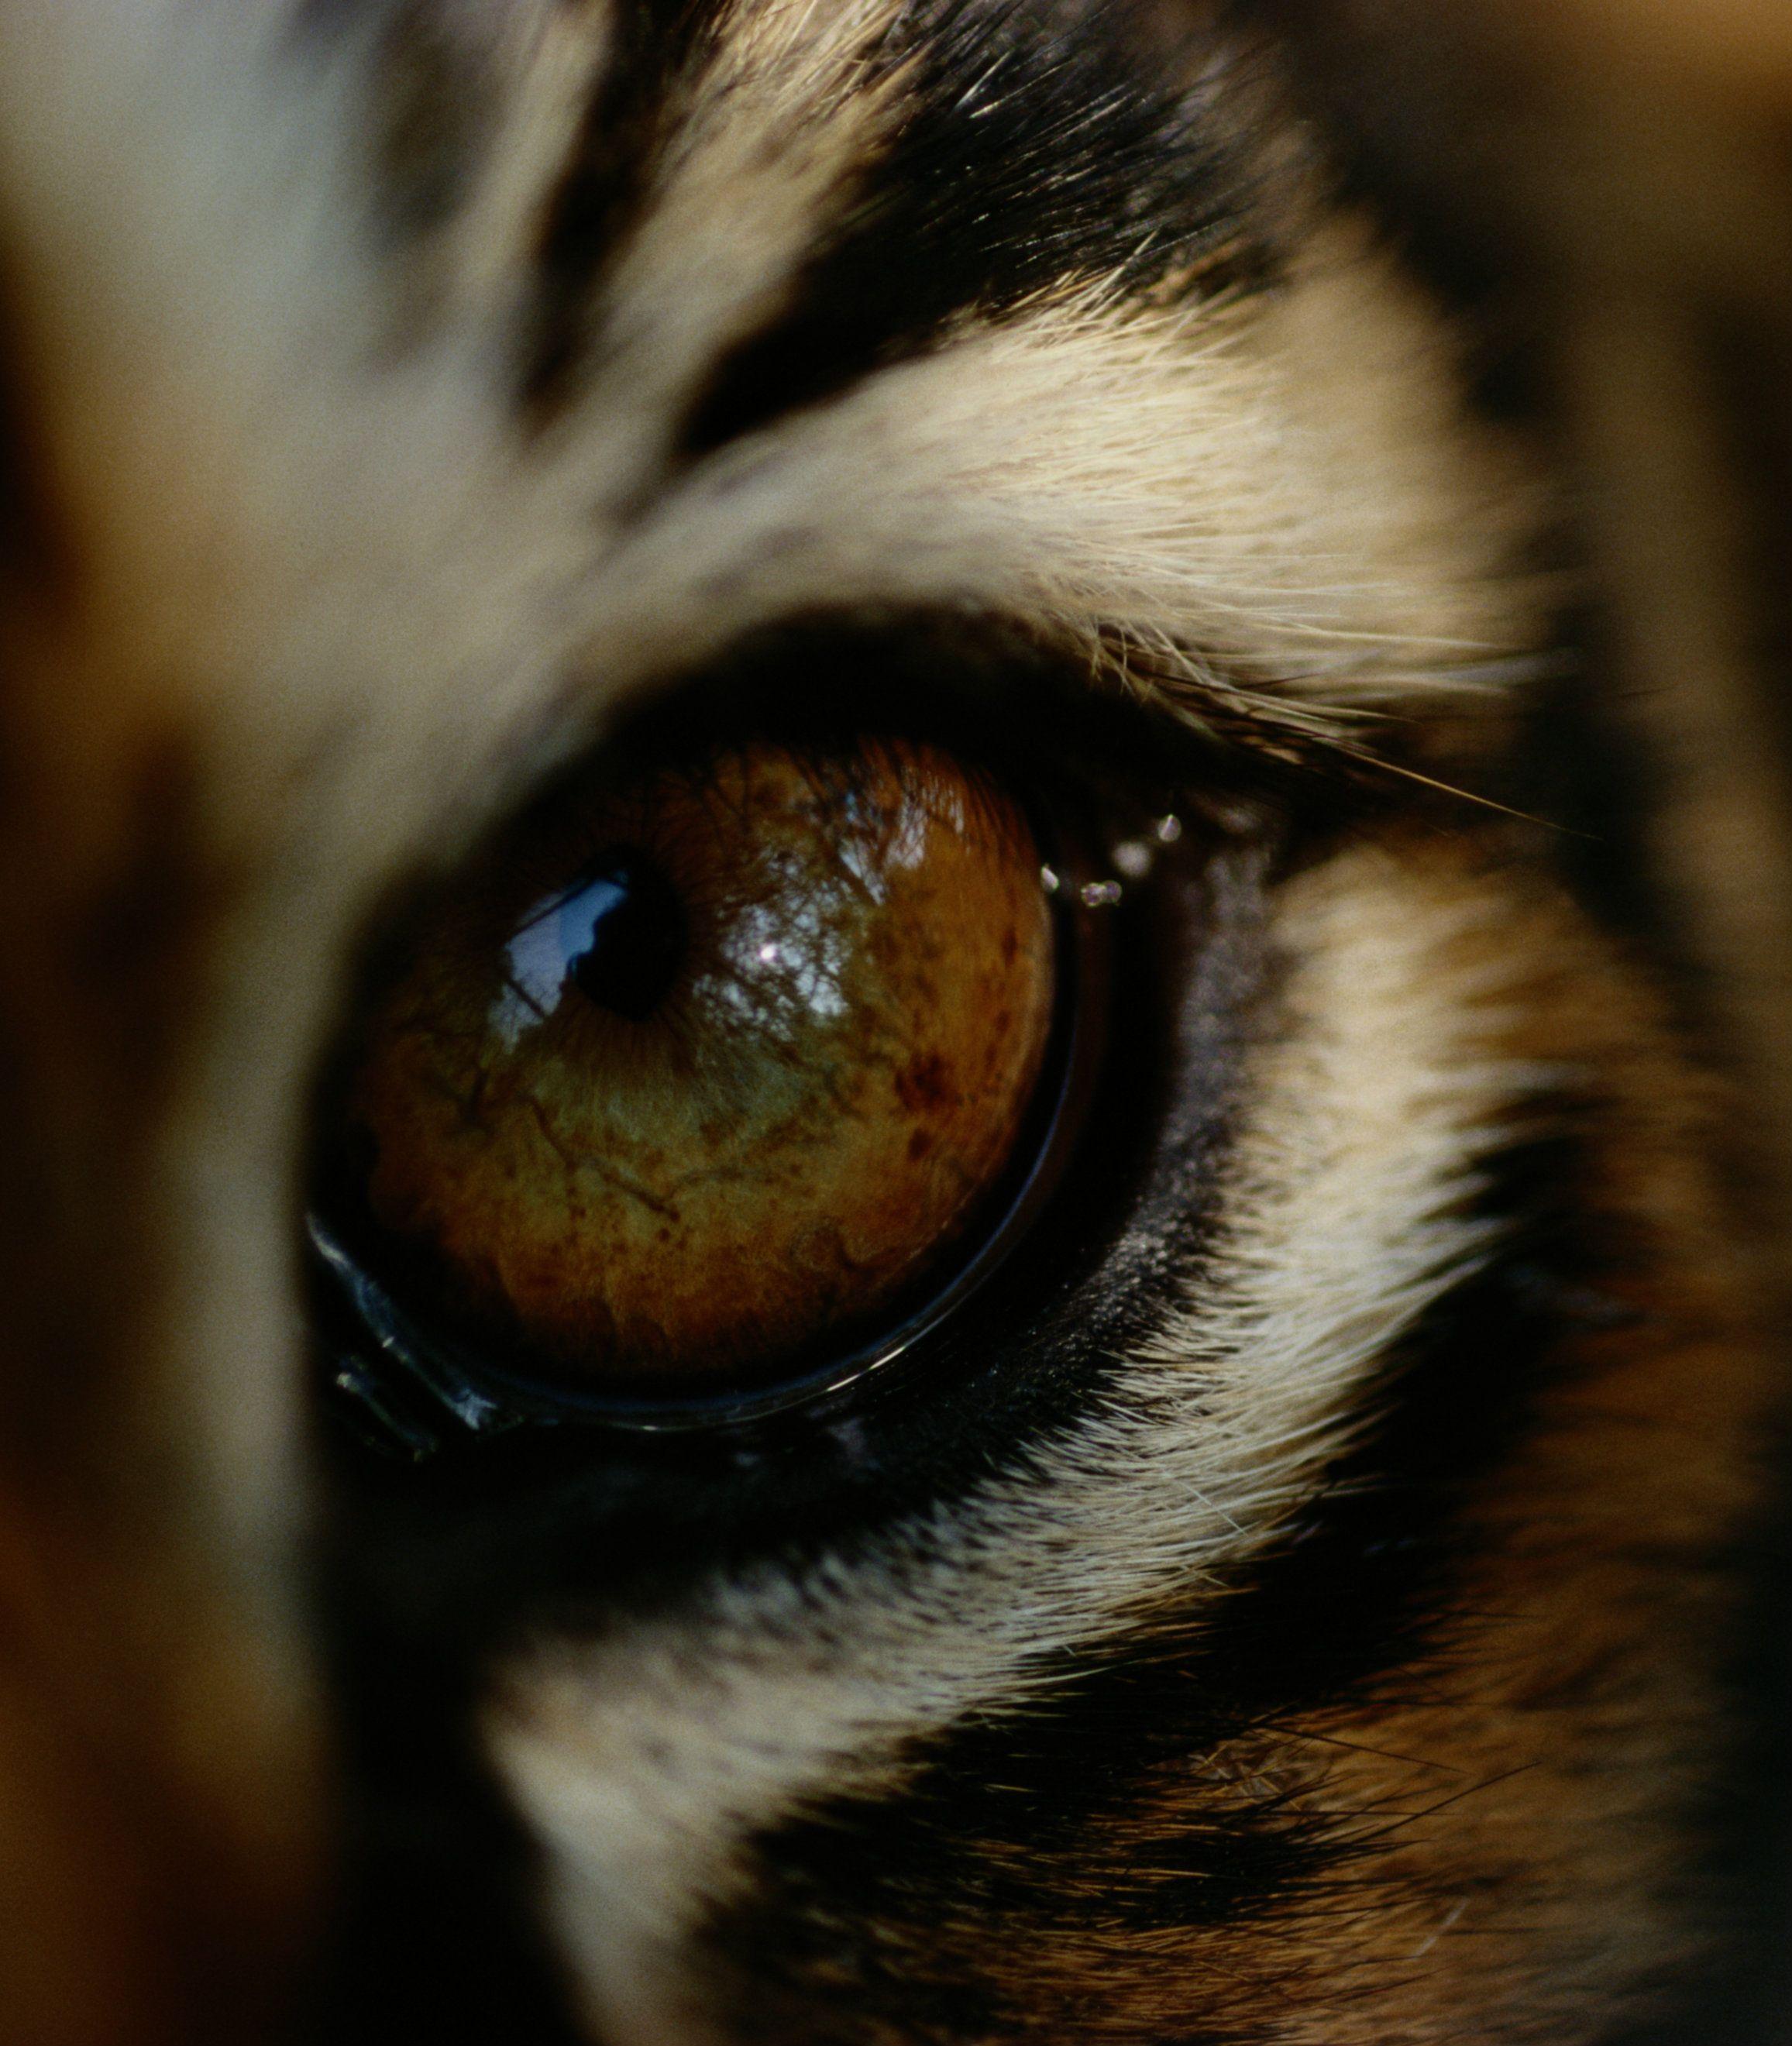 Tiger S Eye Internationaltigerday Bigcats Wwf Tiger Animals